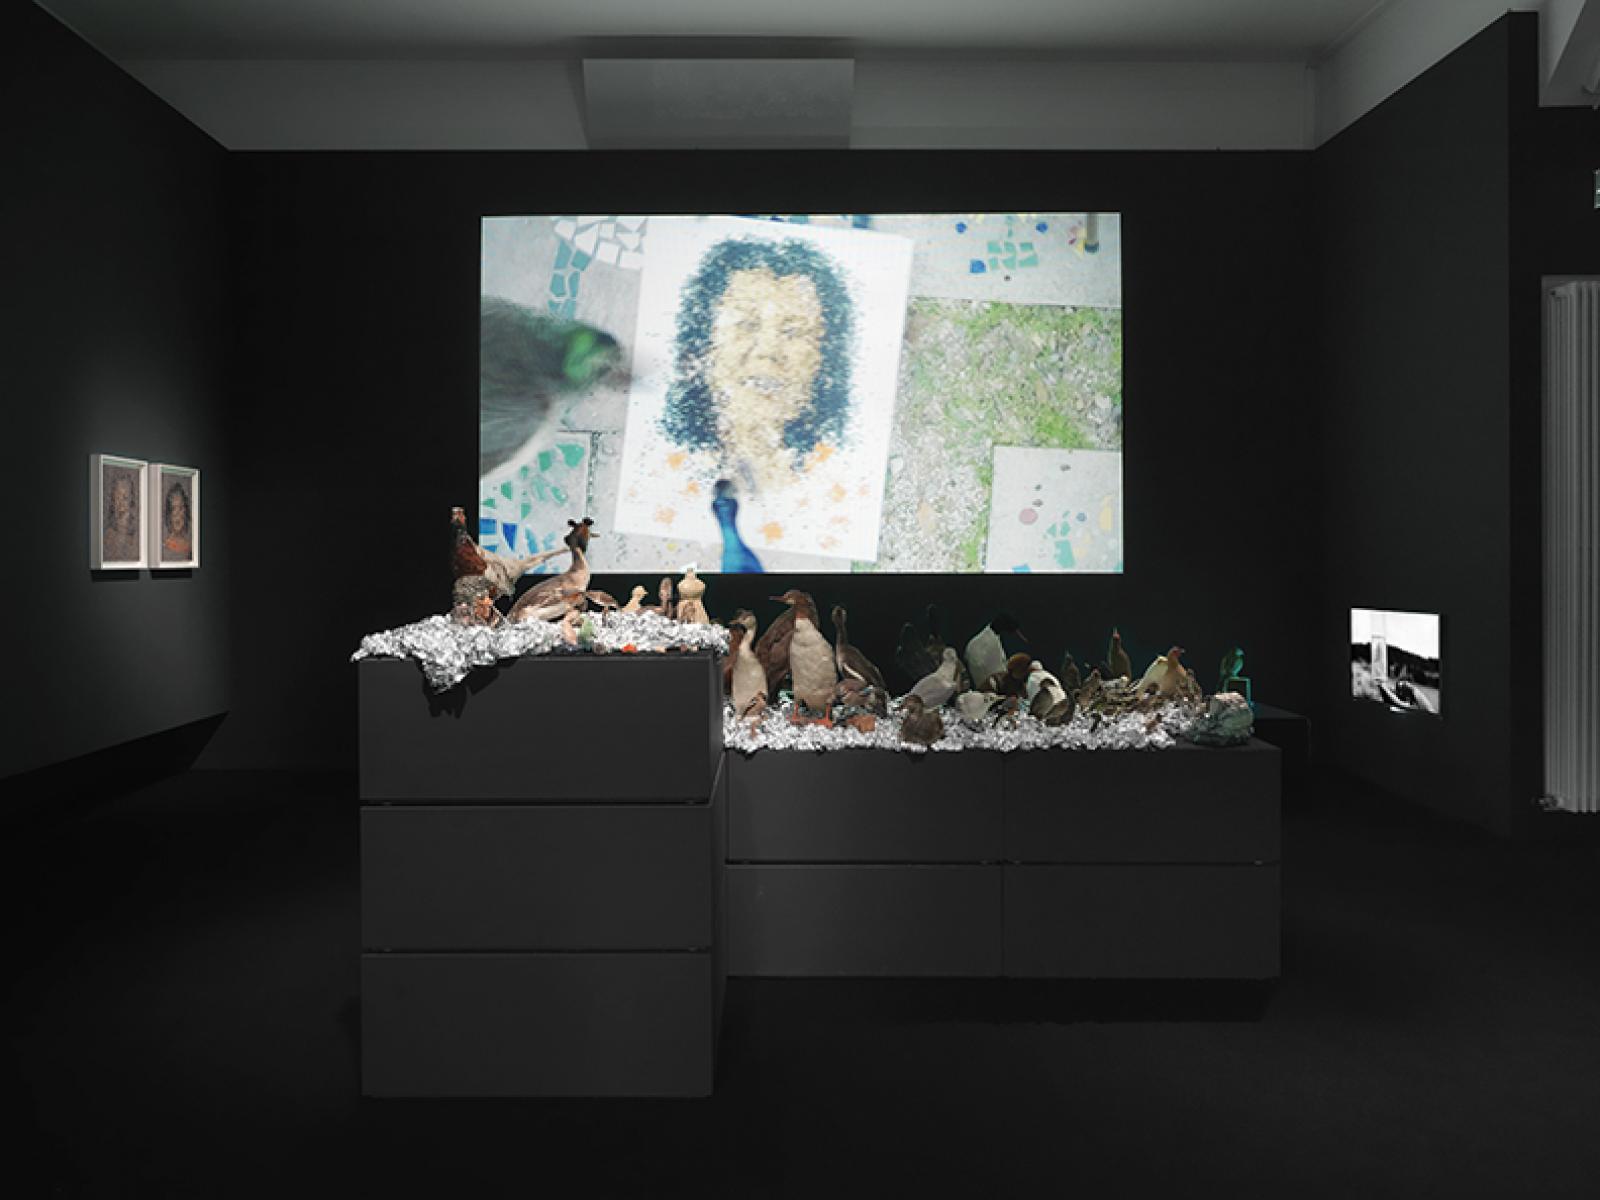 Trisha Baga Installationsansicht /MS Orlando/, 2015 Art Basel Parcours 2016 Photo: Annik Wetter. Courtesy the artist and Greene Naftali, New York